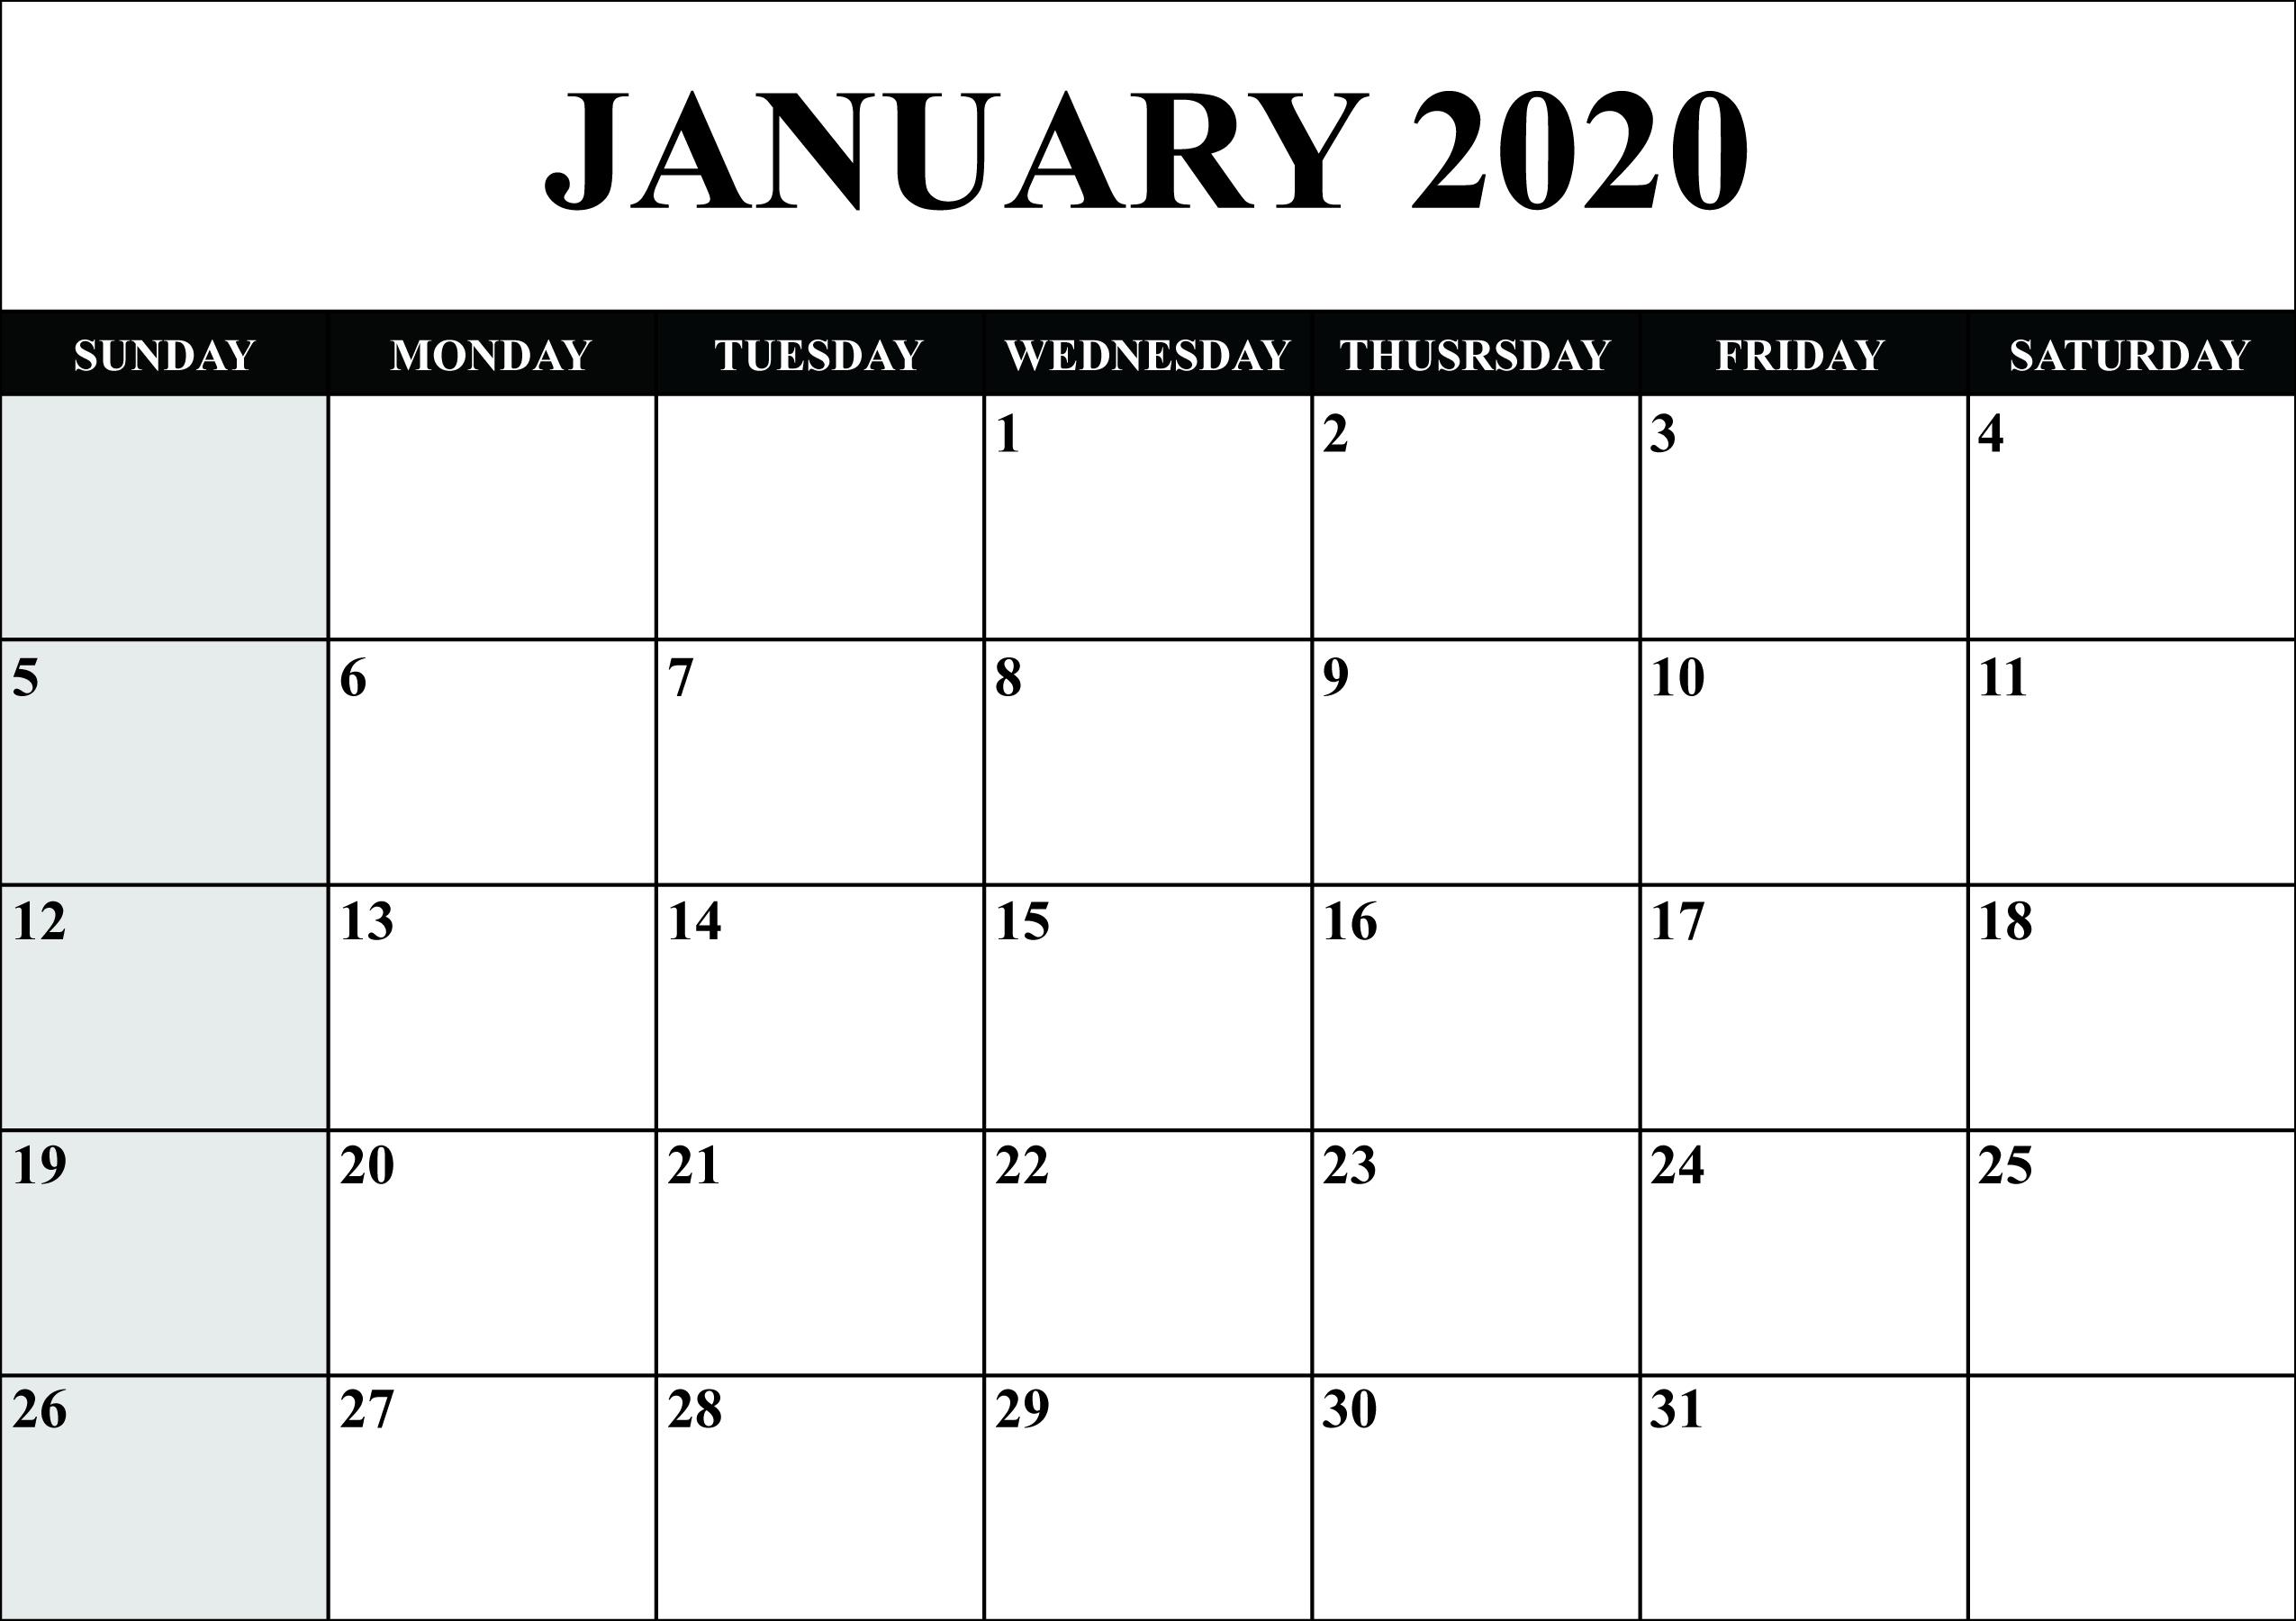 Free Blank January 2020 Calendar Printable In Pdf, Word throughout 2020 Printable Monthly Calendar Free Vertex